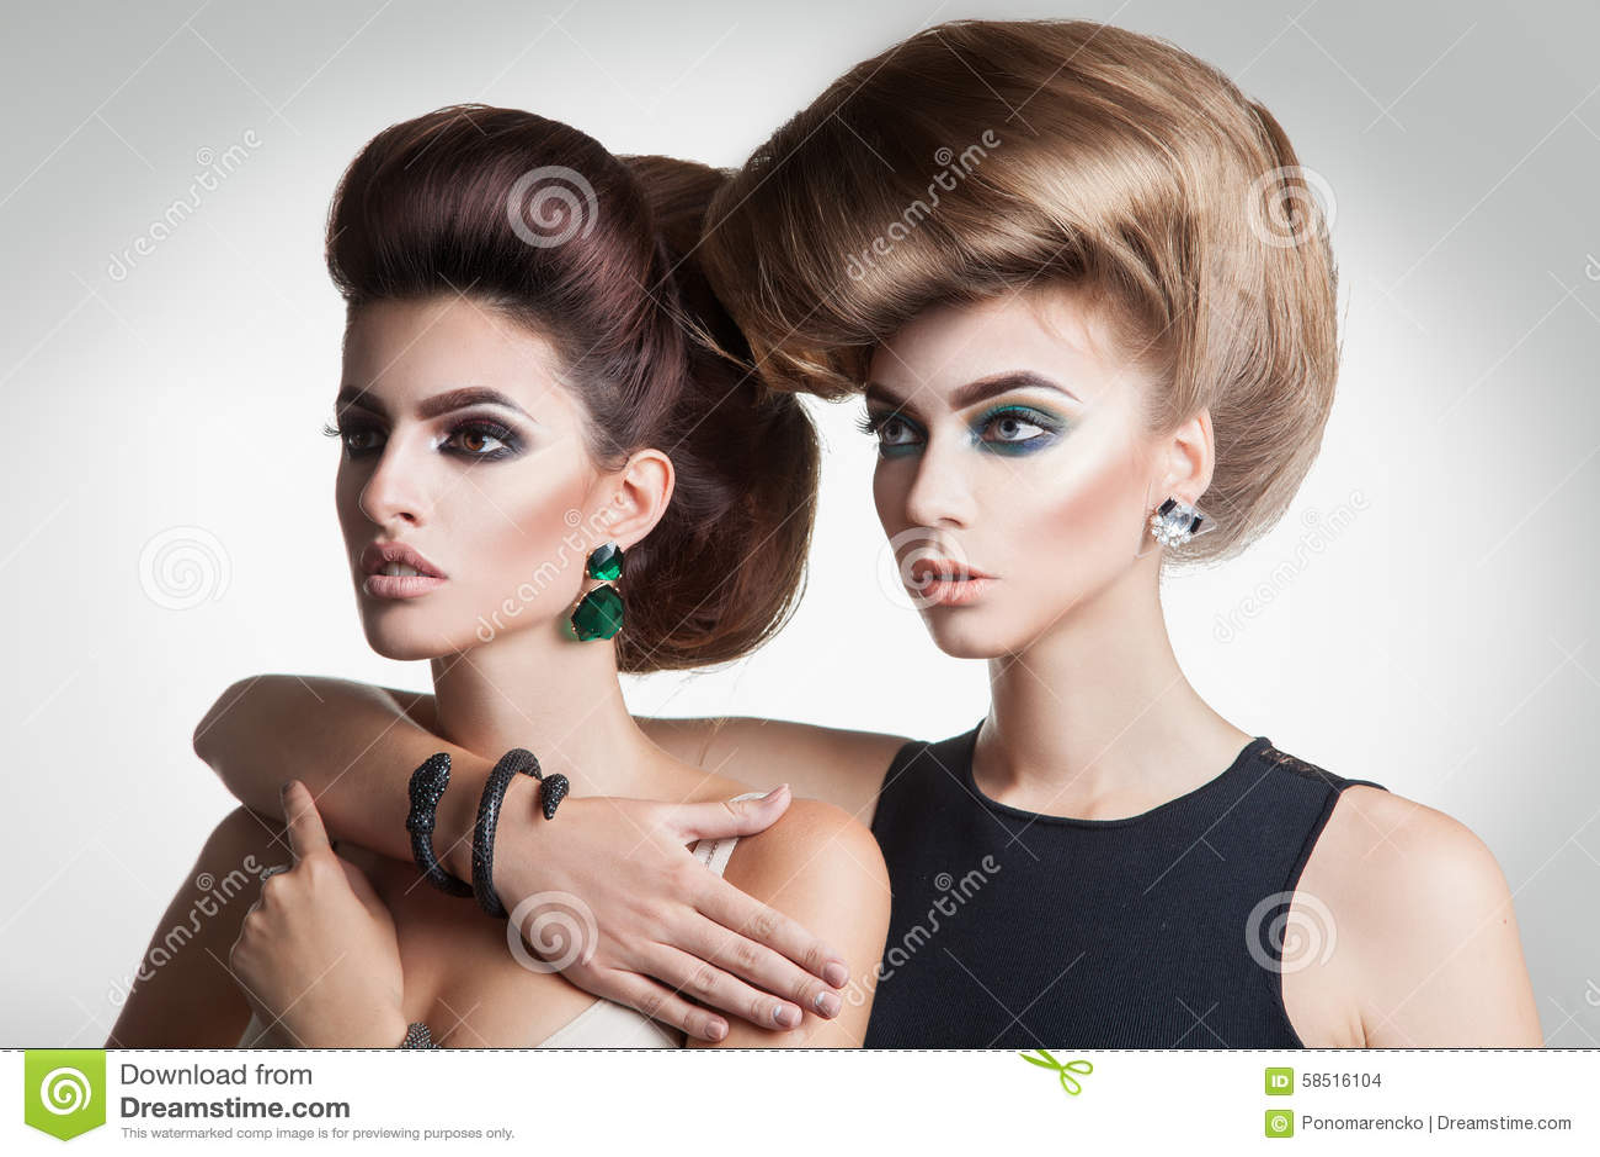 Closeup Portrait Of Two Beauty Fashion Women With Creative